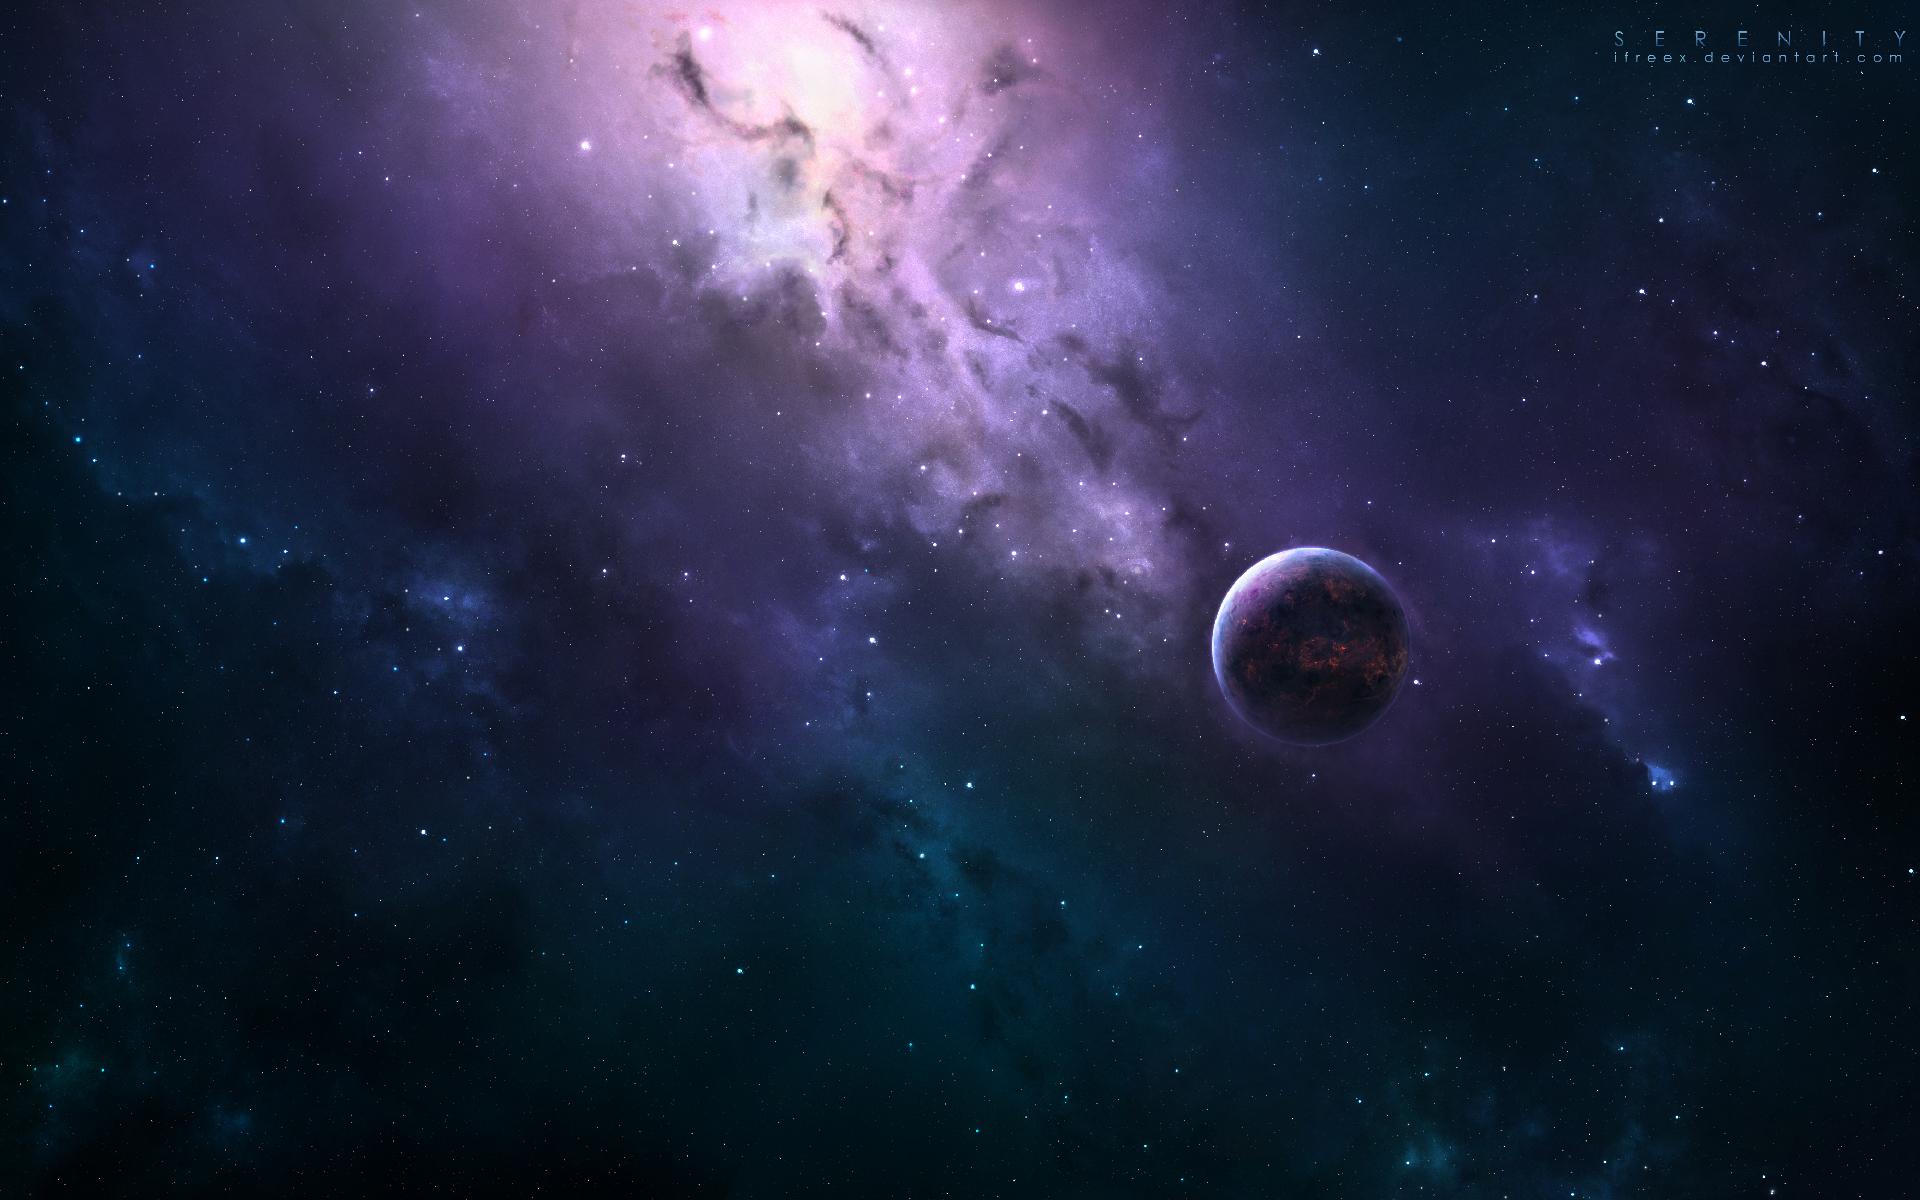 Digital Universe Galaxy Laptop Full HD 1080P